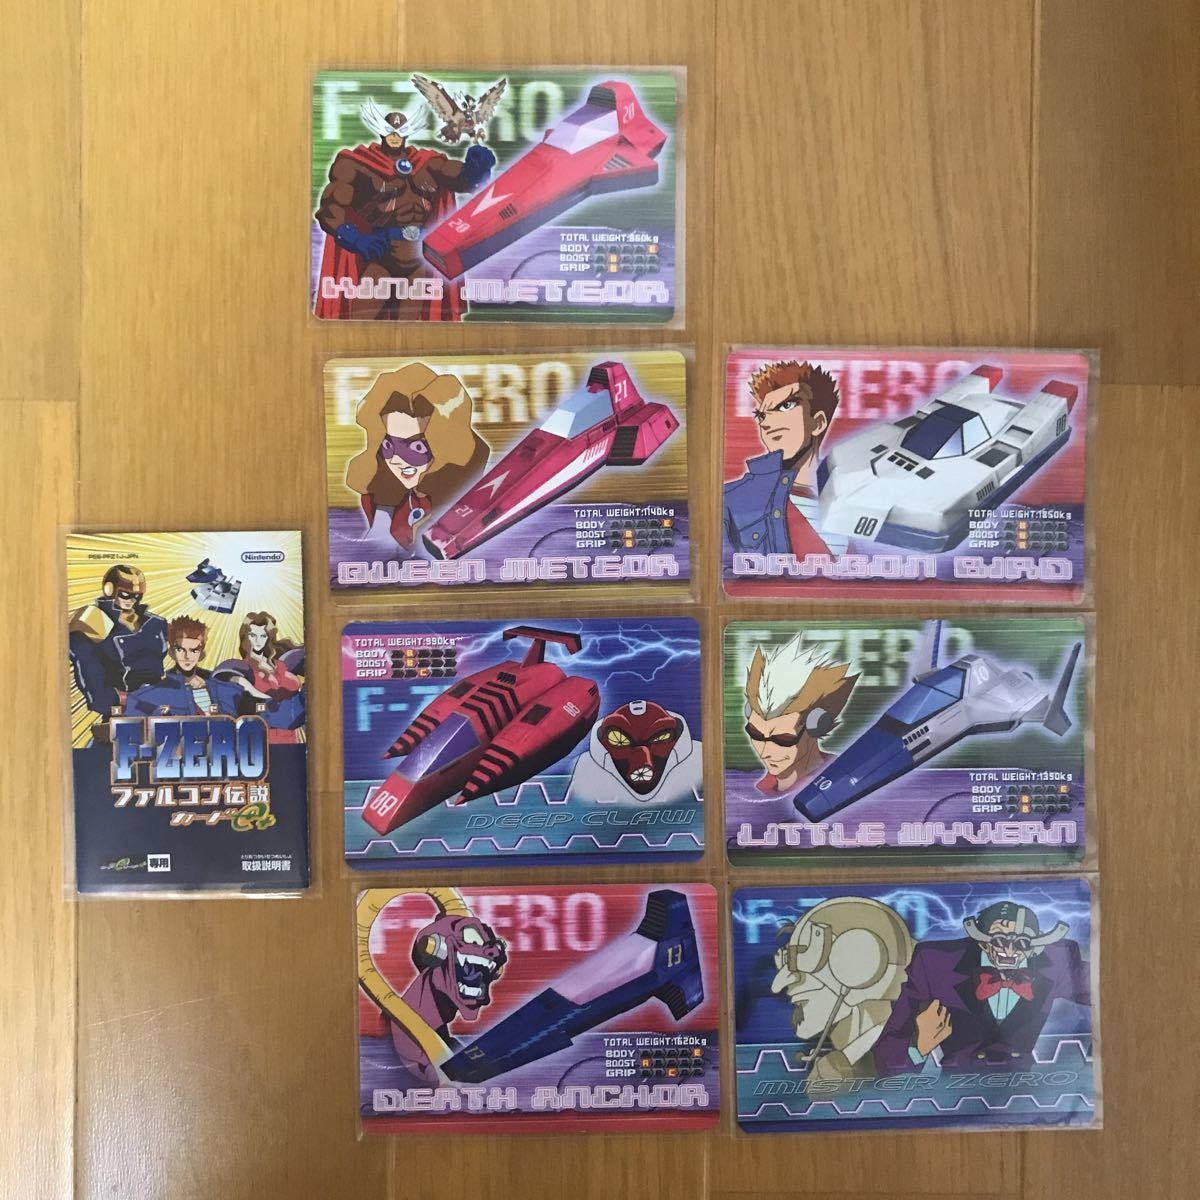 GBA  F-ZERO ファルコン伝説 &【希少】7枚 カードダス版 2枚有り☆ファルコン伝説カードe+ トレカ カード 任天堂 キャプテンファルコン